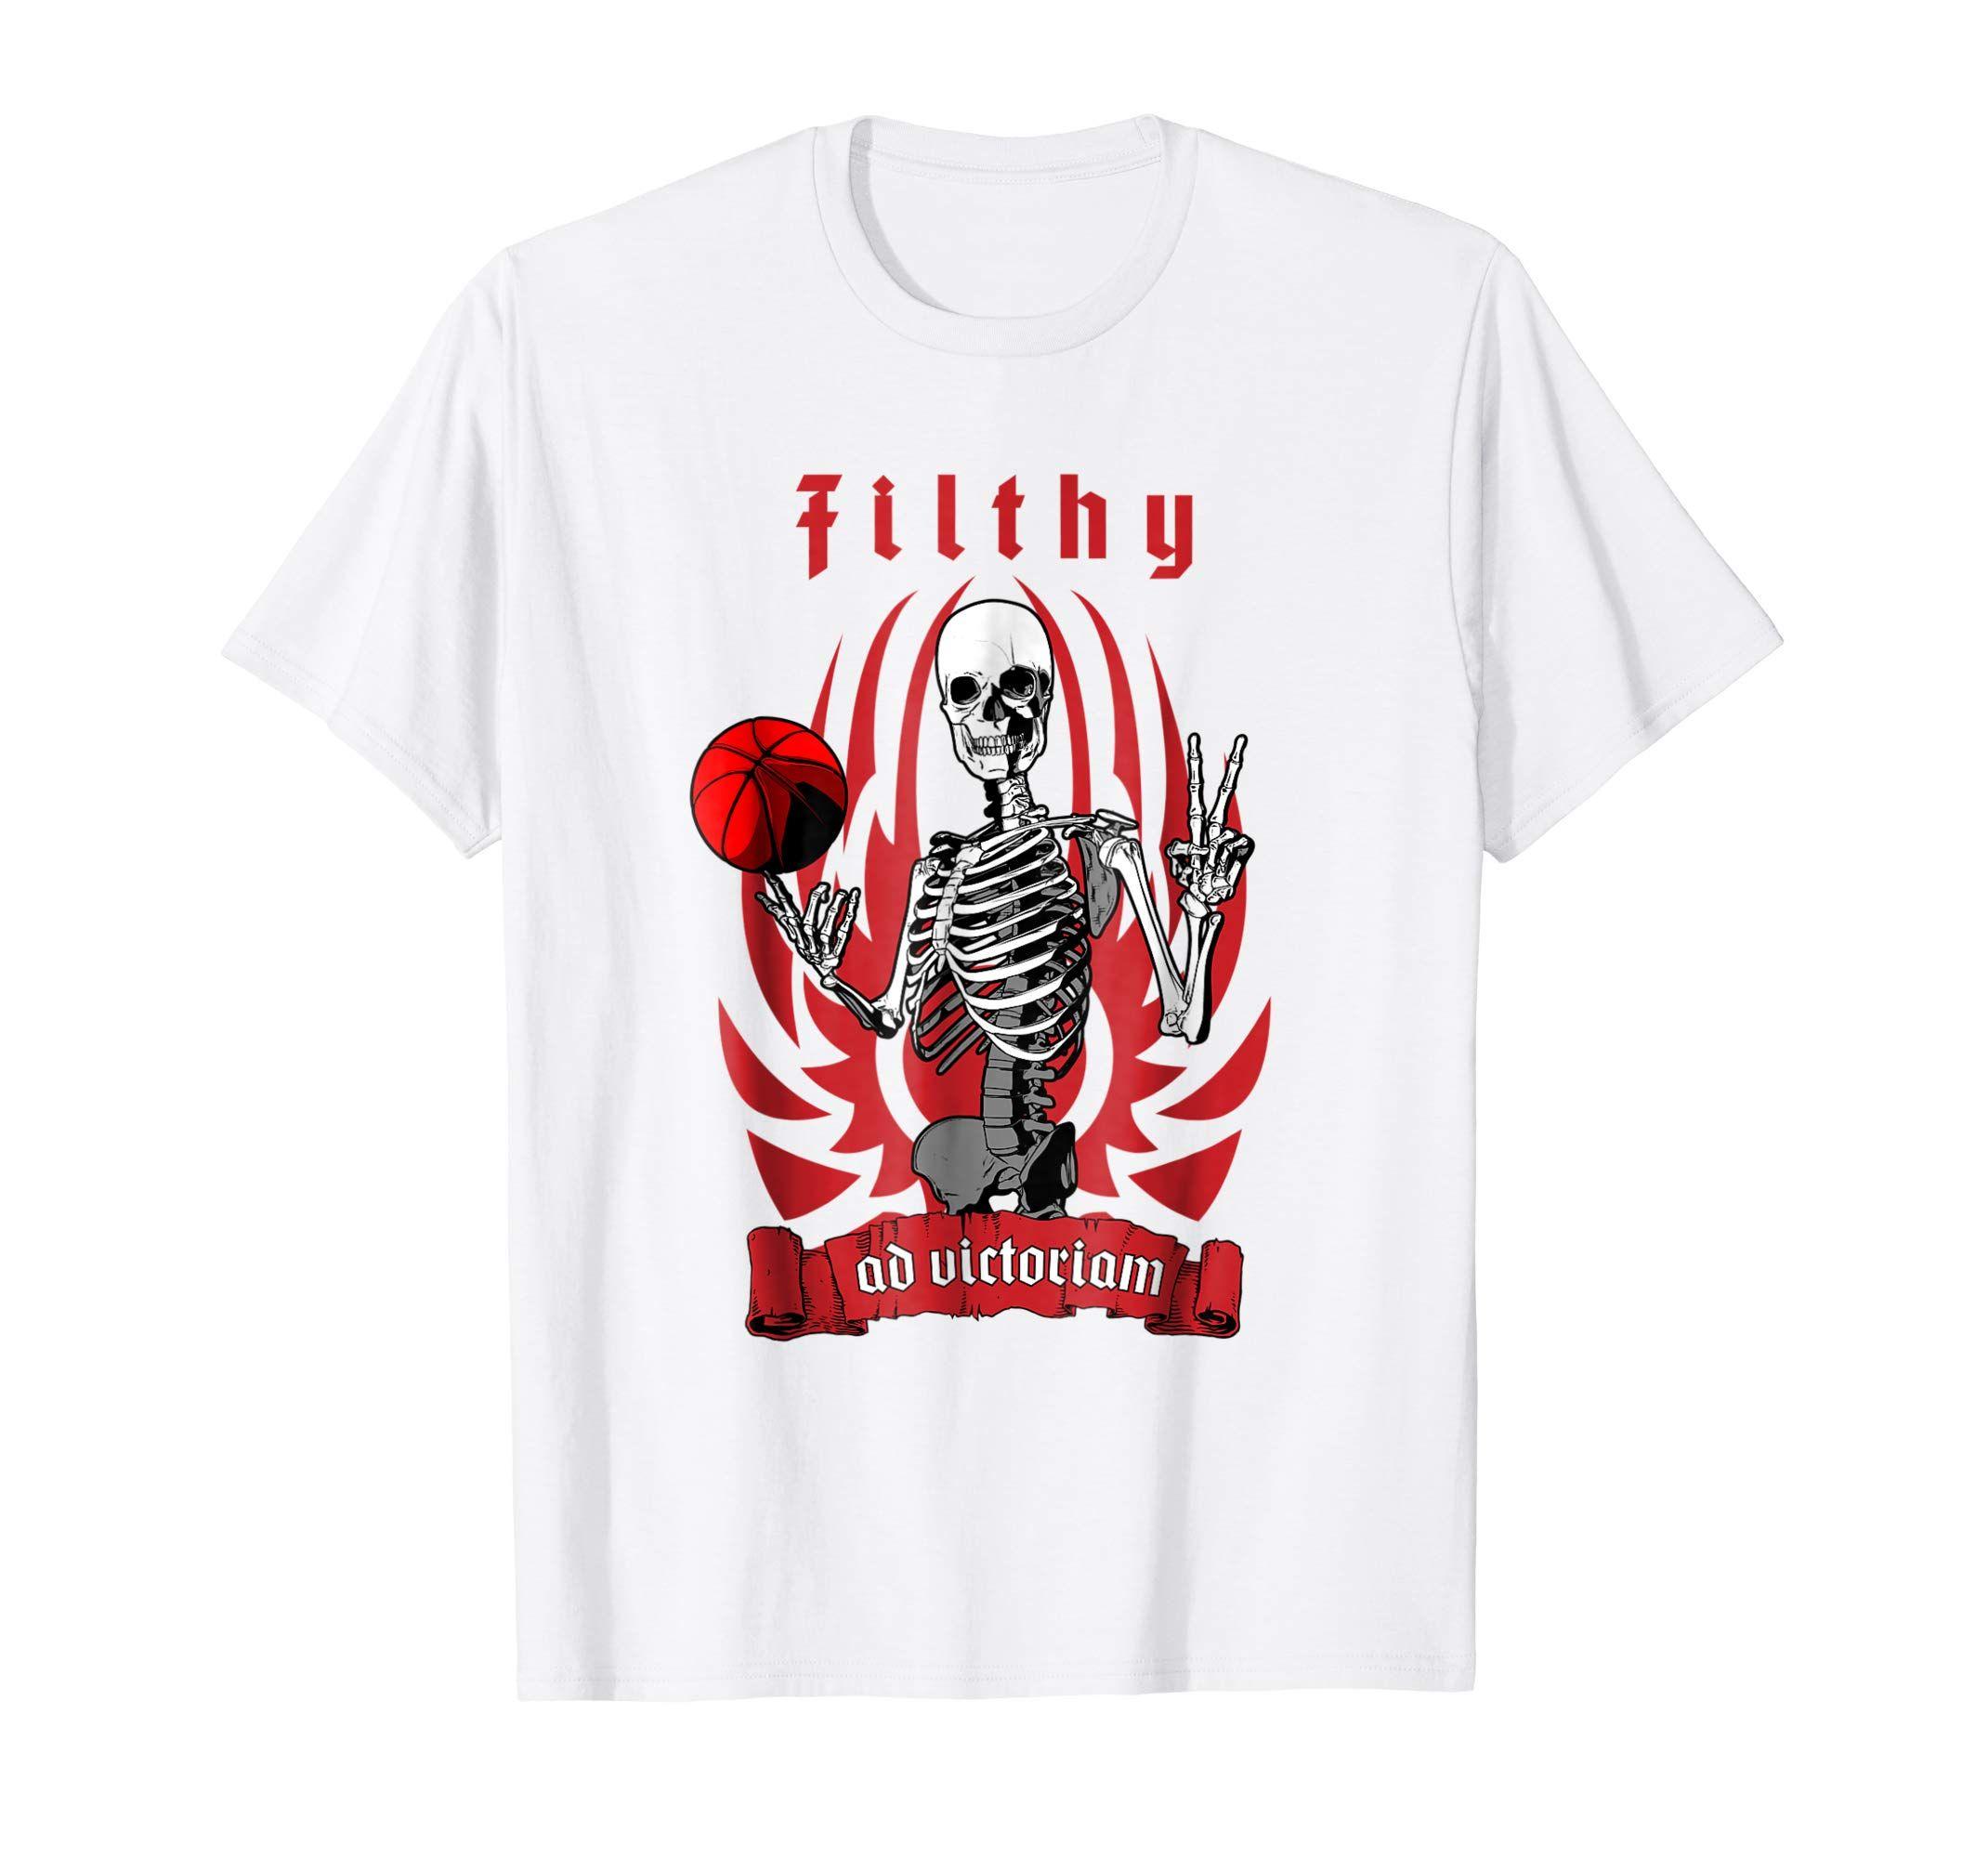 490b3c1477082 Amazon.com: Filthy Basketball Player Skeleton T-shirt: Clothing ...